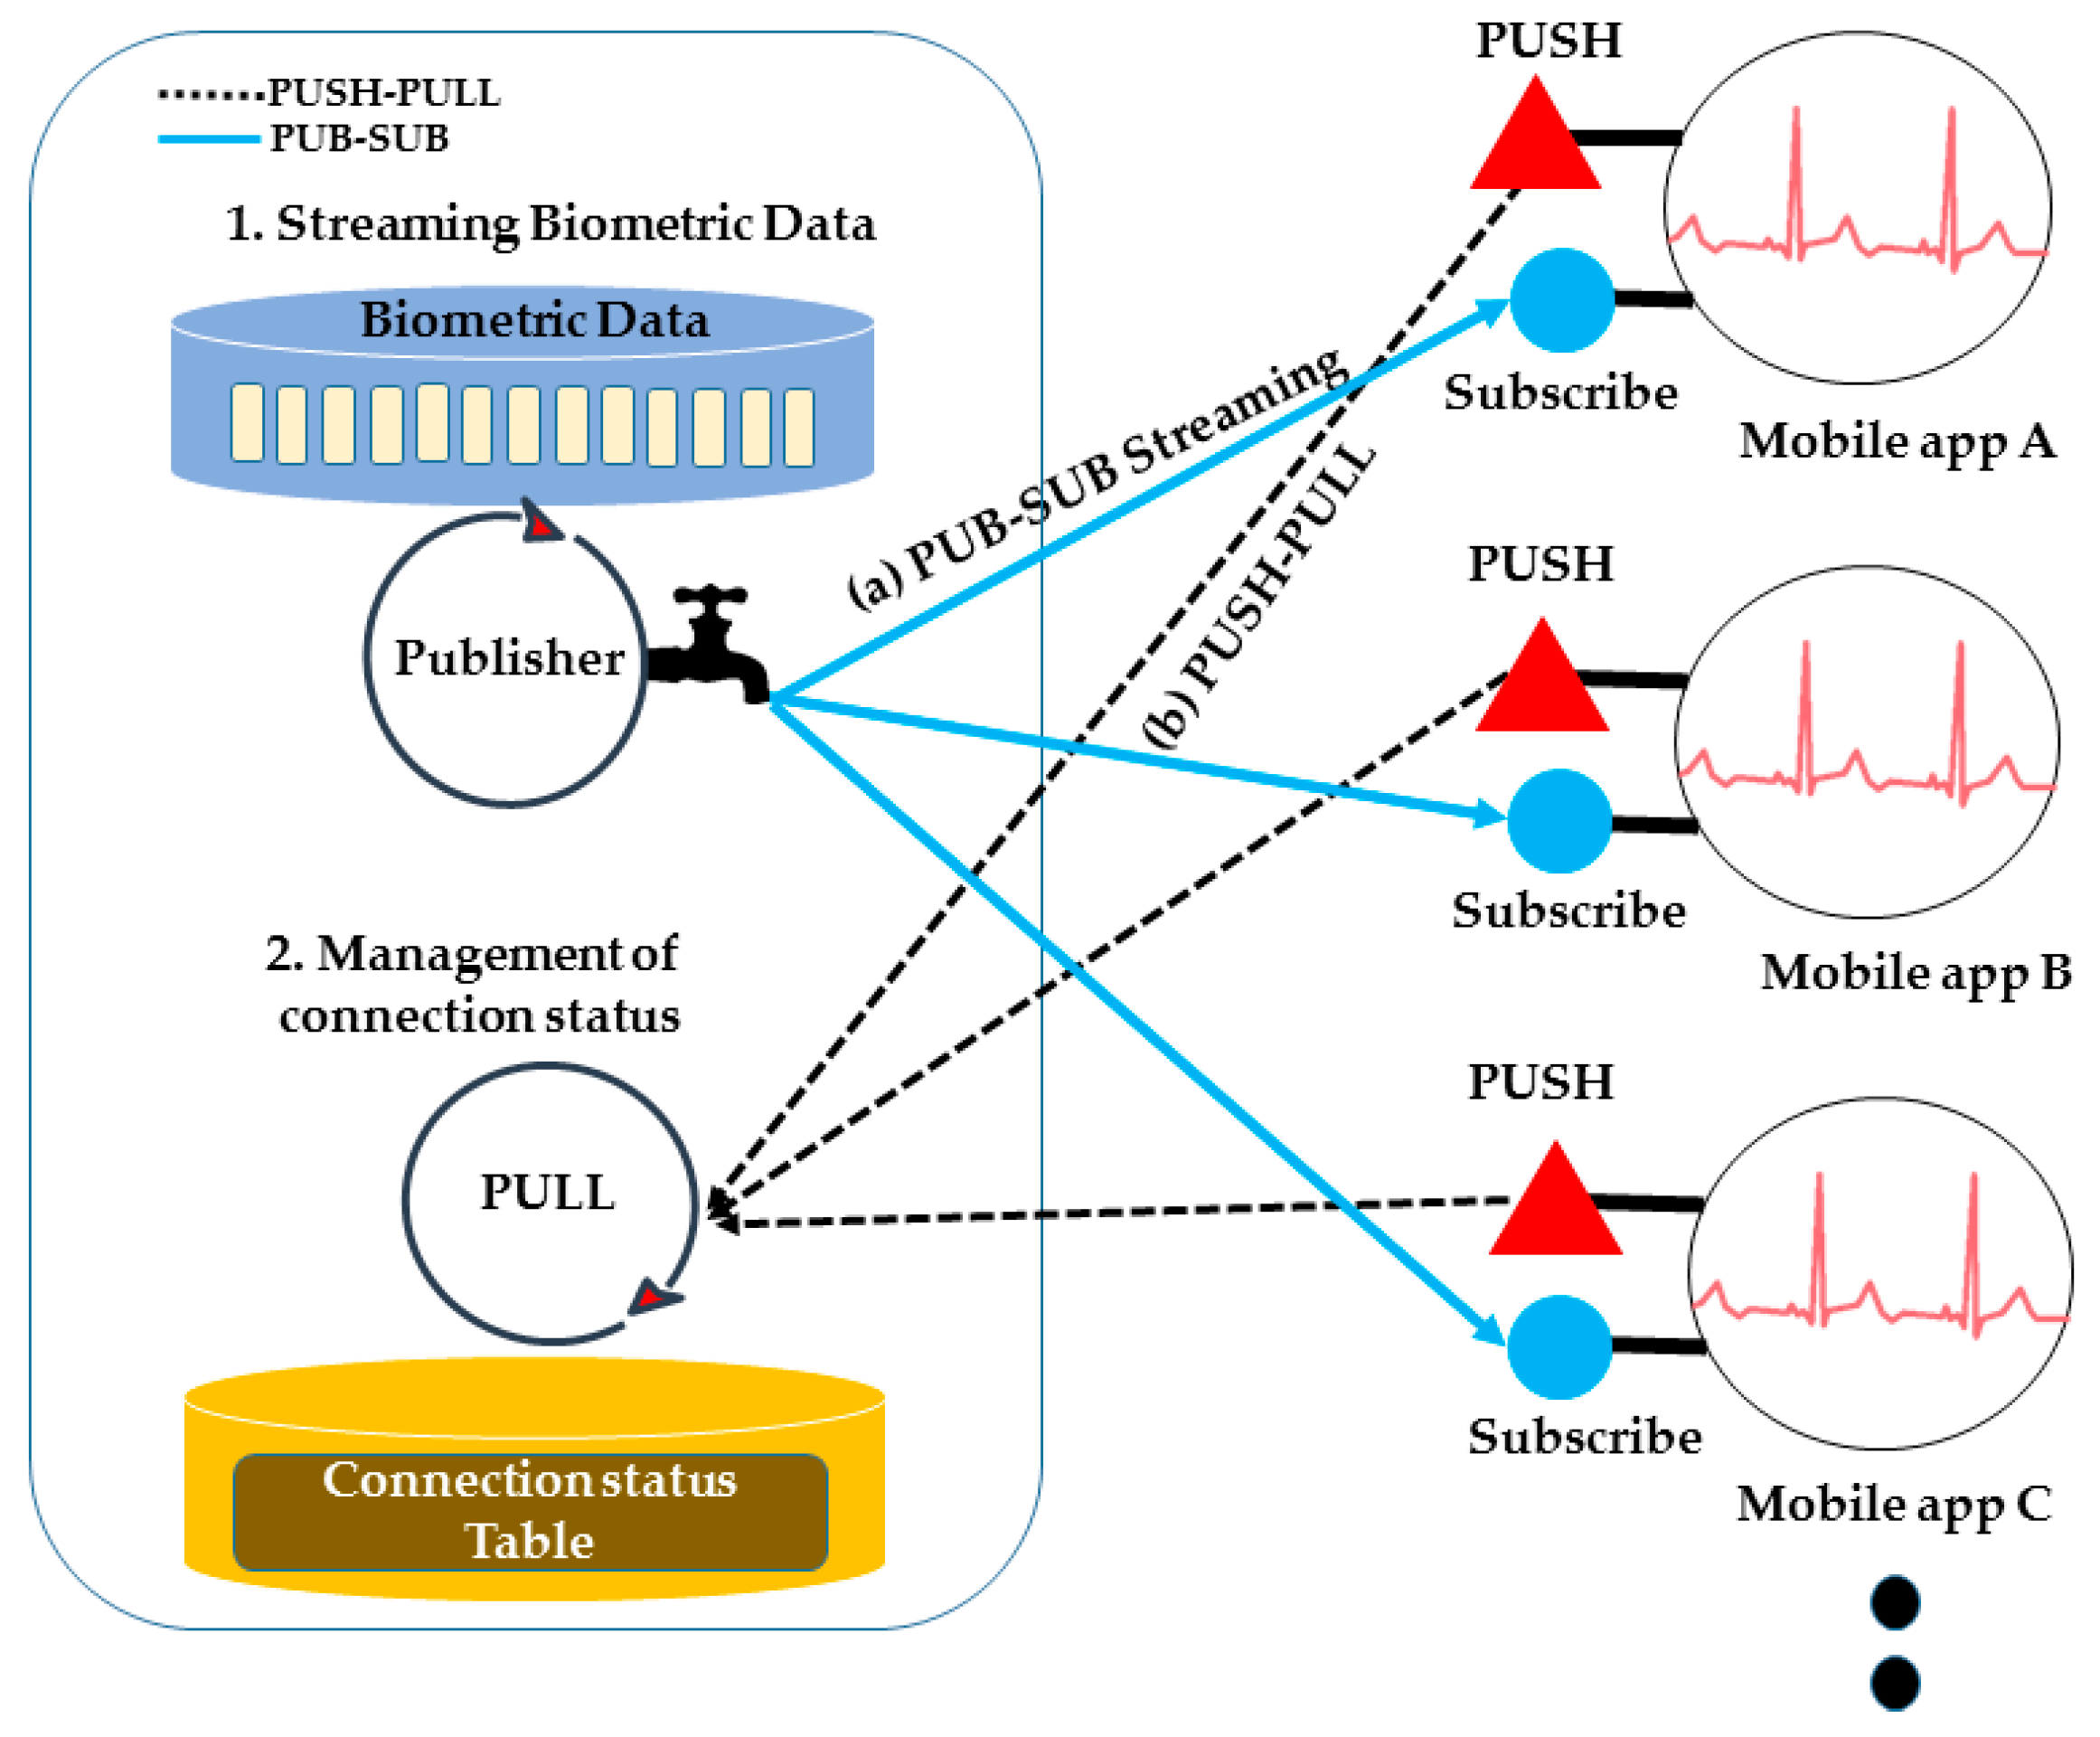 sensors 17 02650 g008 sensors free full text self organizing peer to peer middleware  at aneh.co